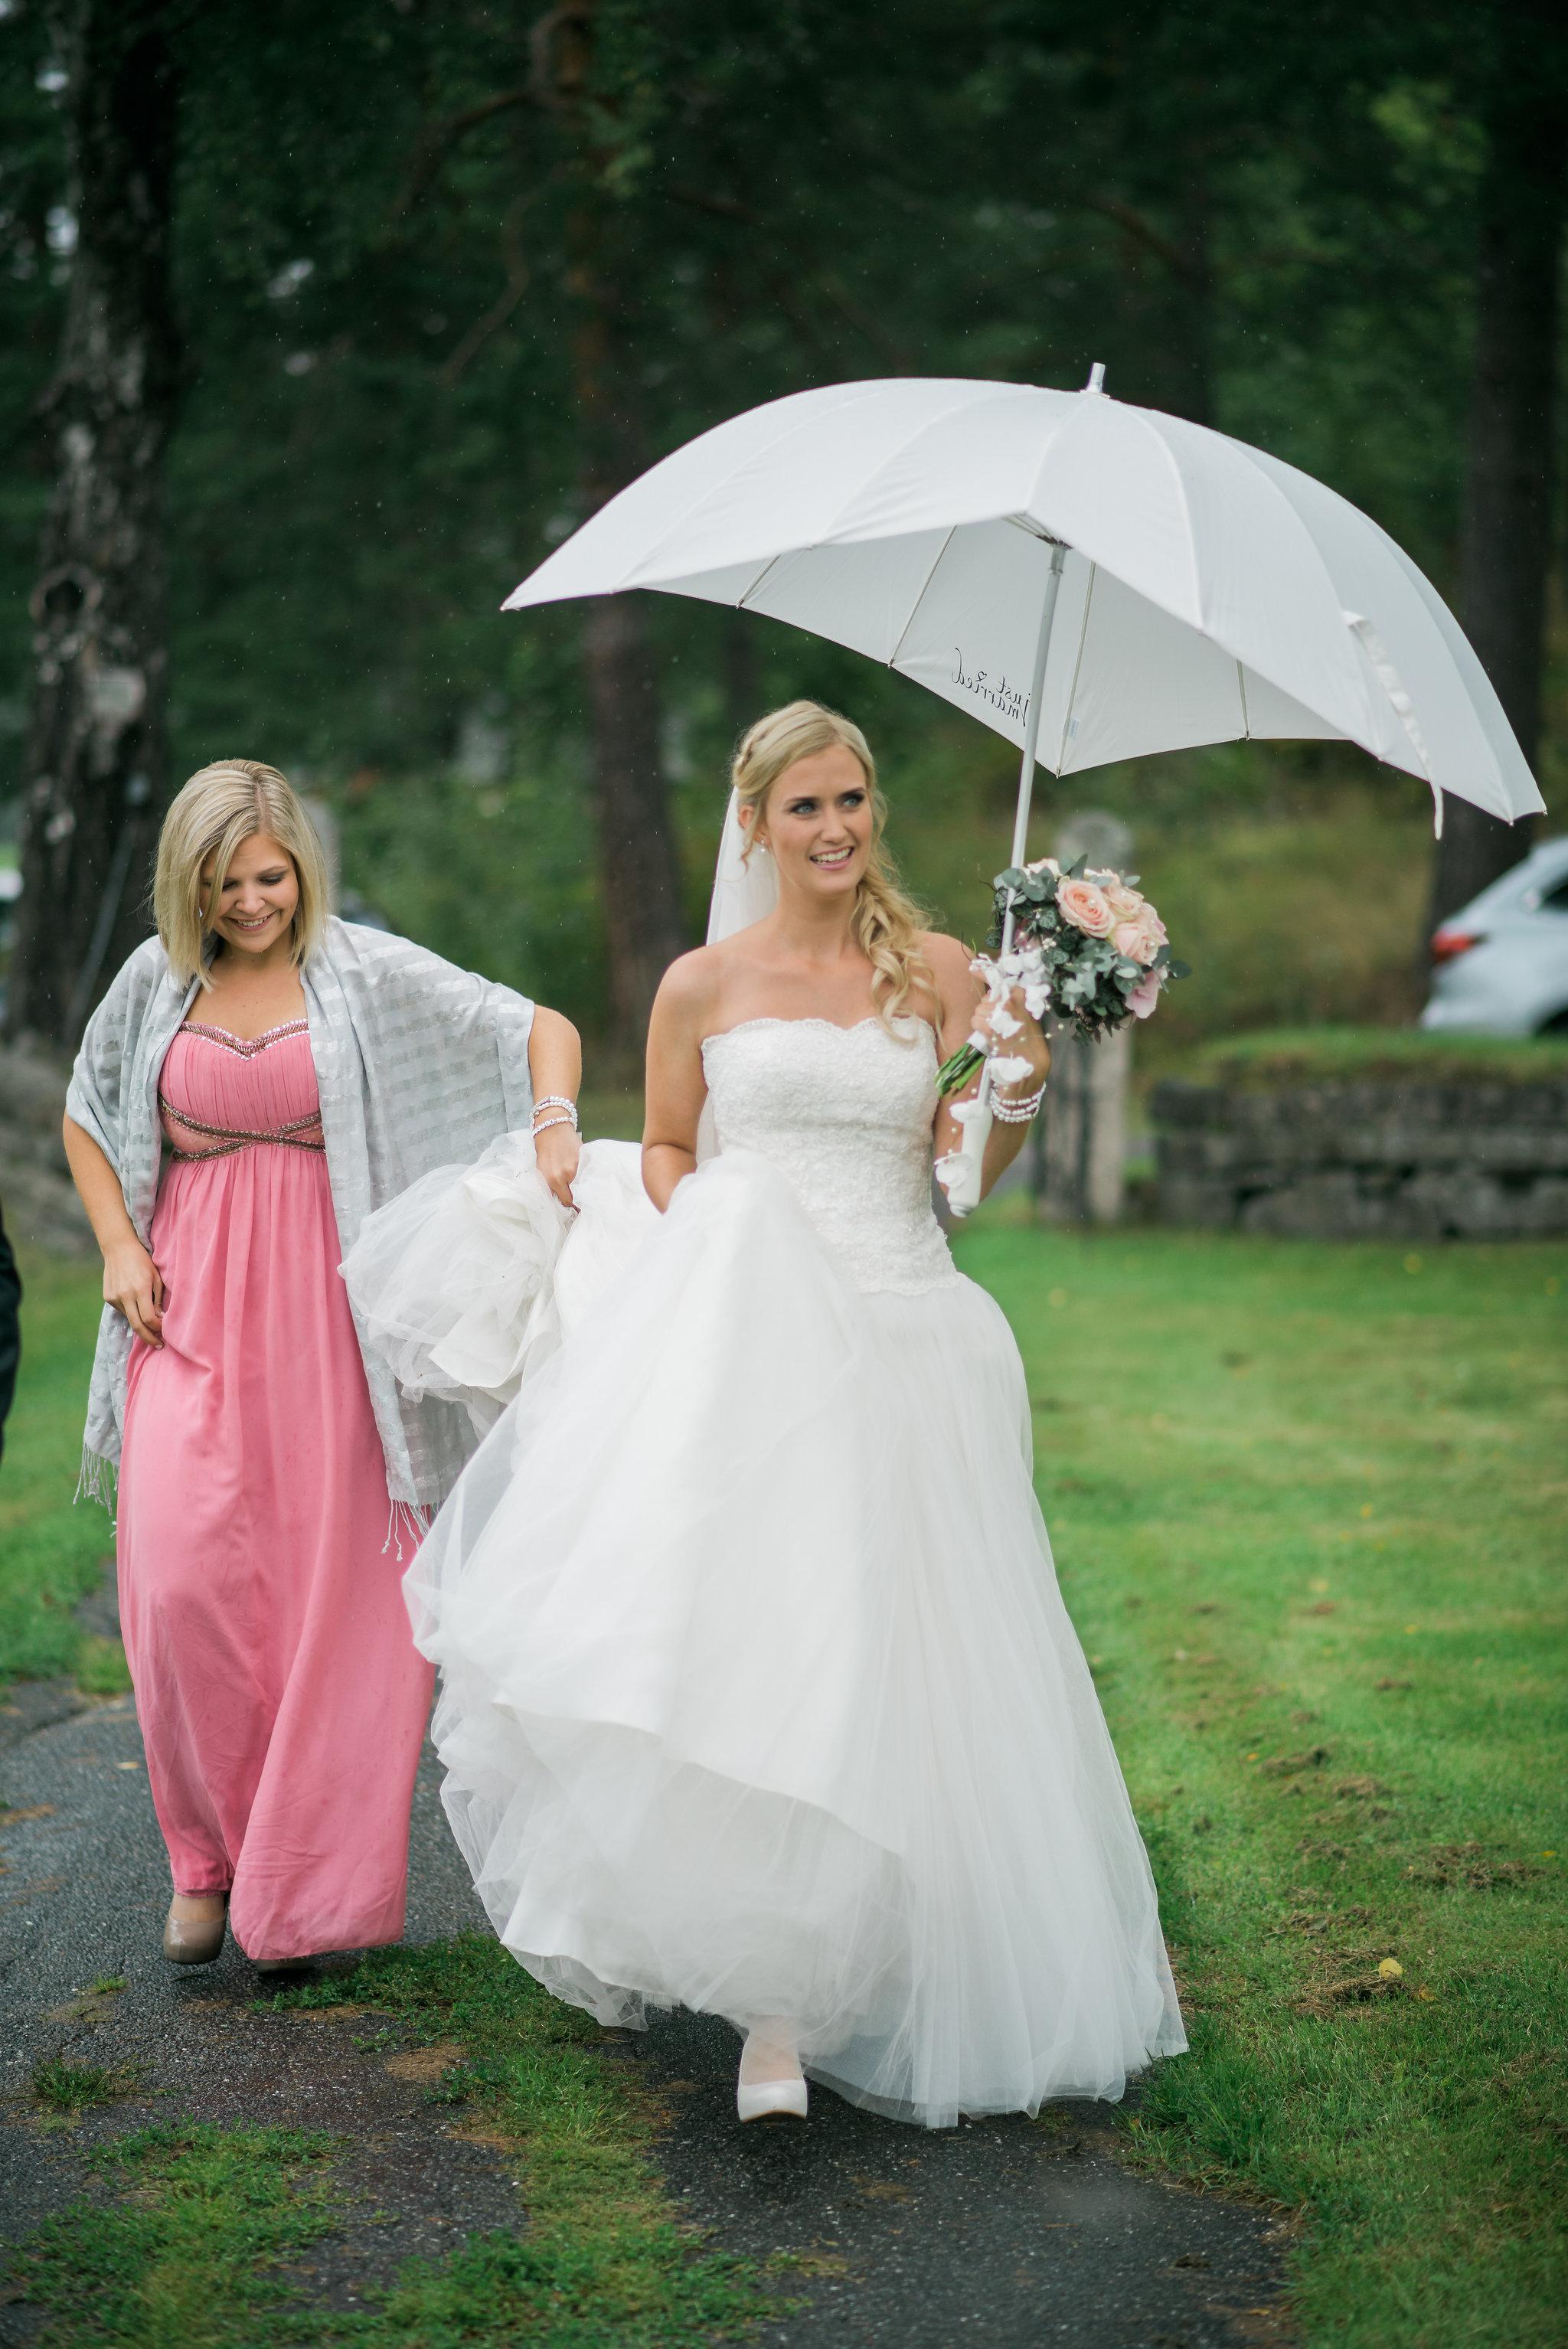 _6007445-2fotograf-bryllup-tyrifjorden.jpg